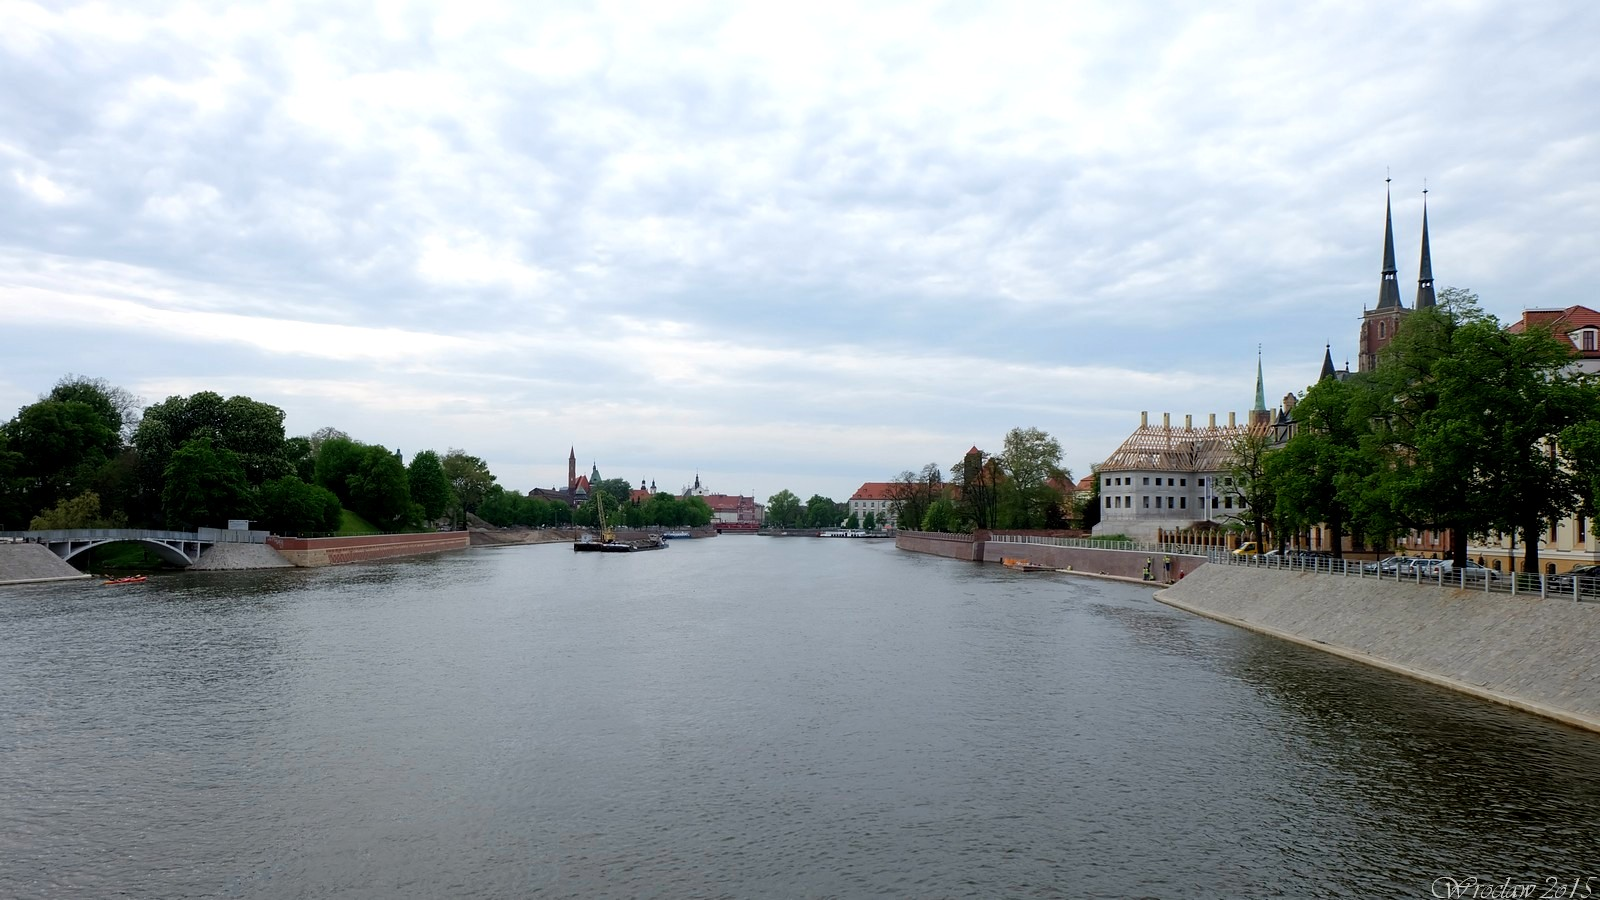 Odra, Wroclaw, Poland